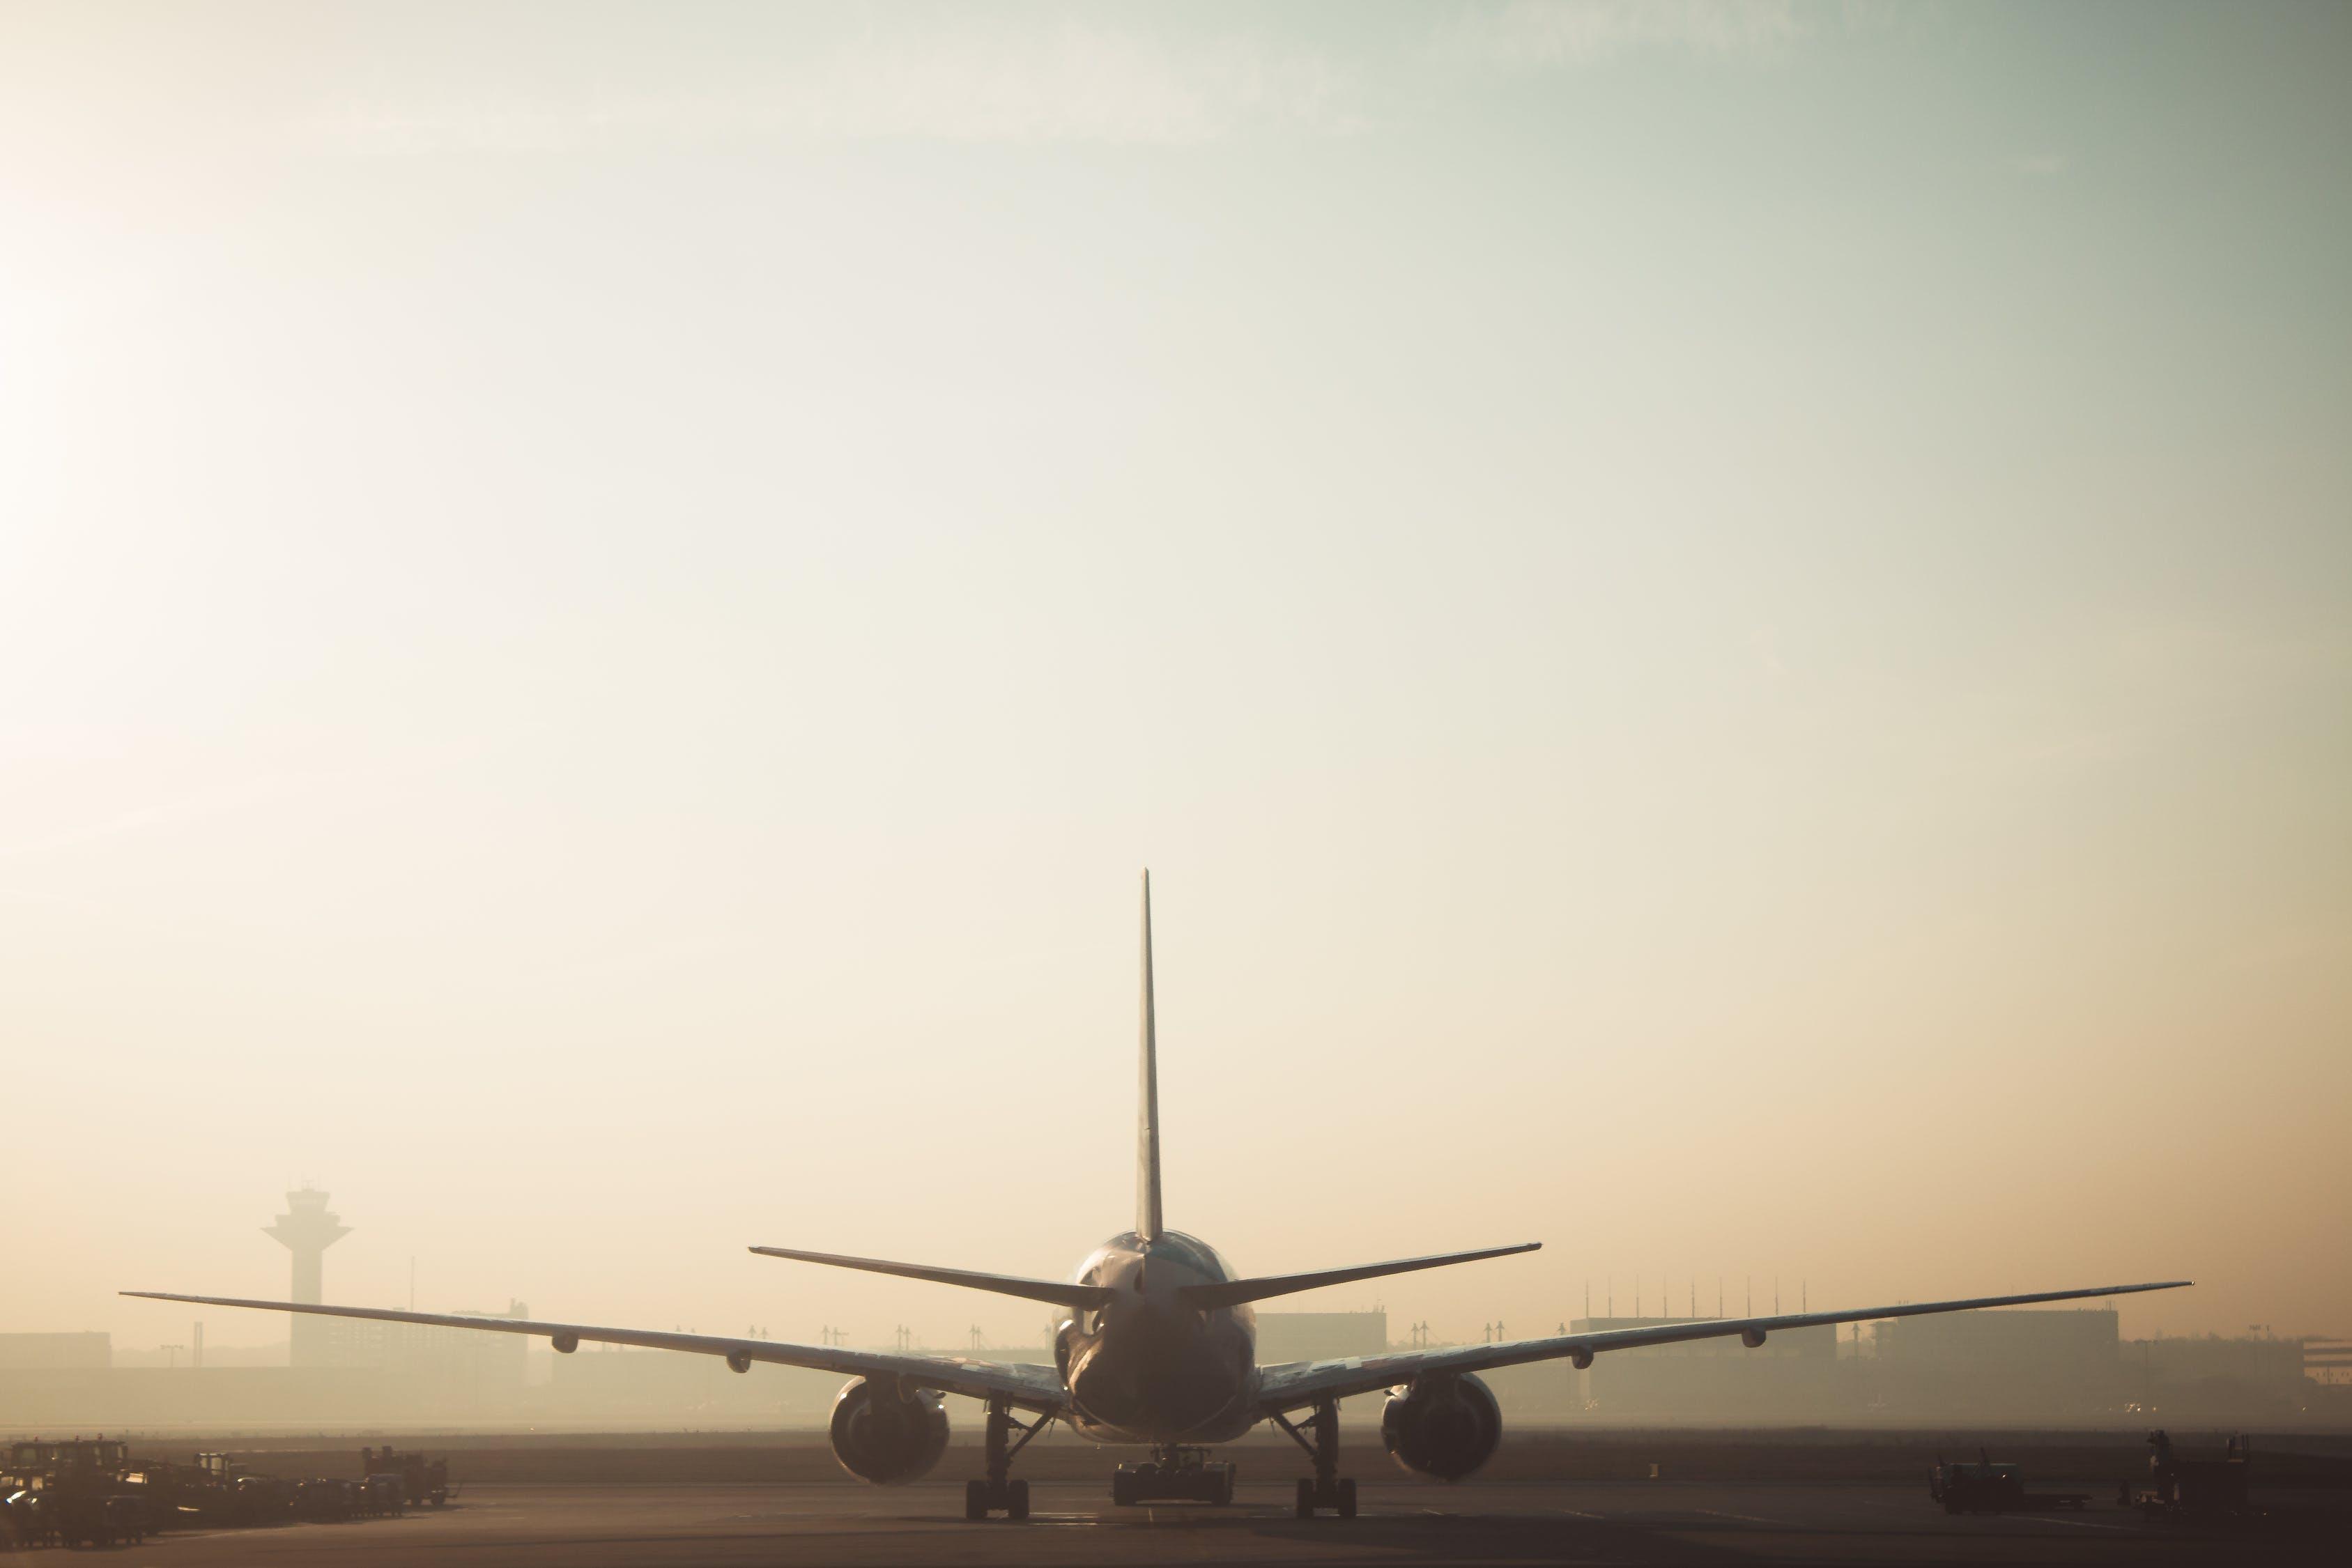 White and Gray Airplane